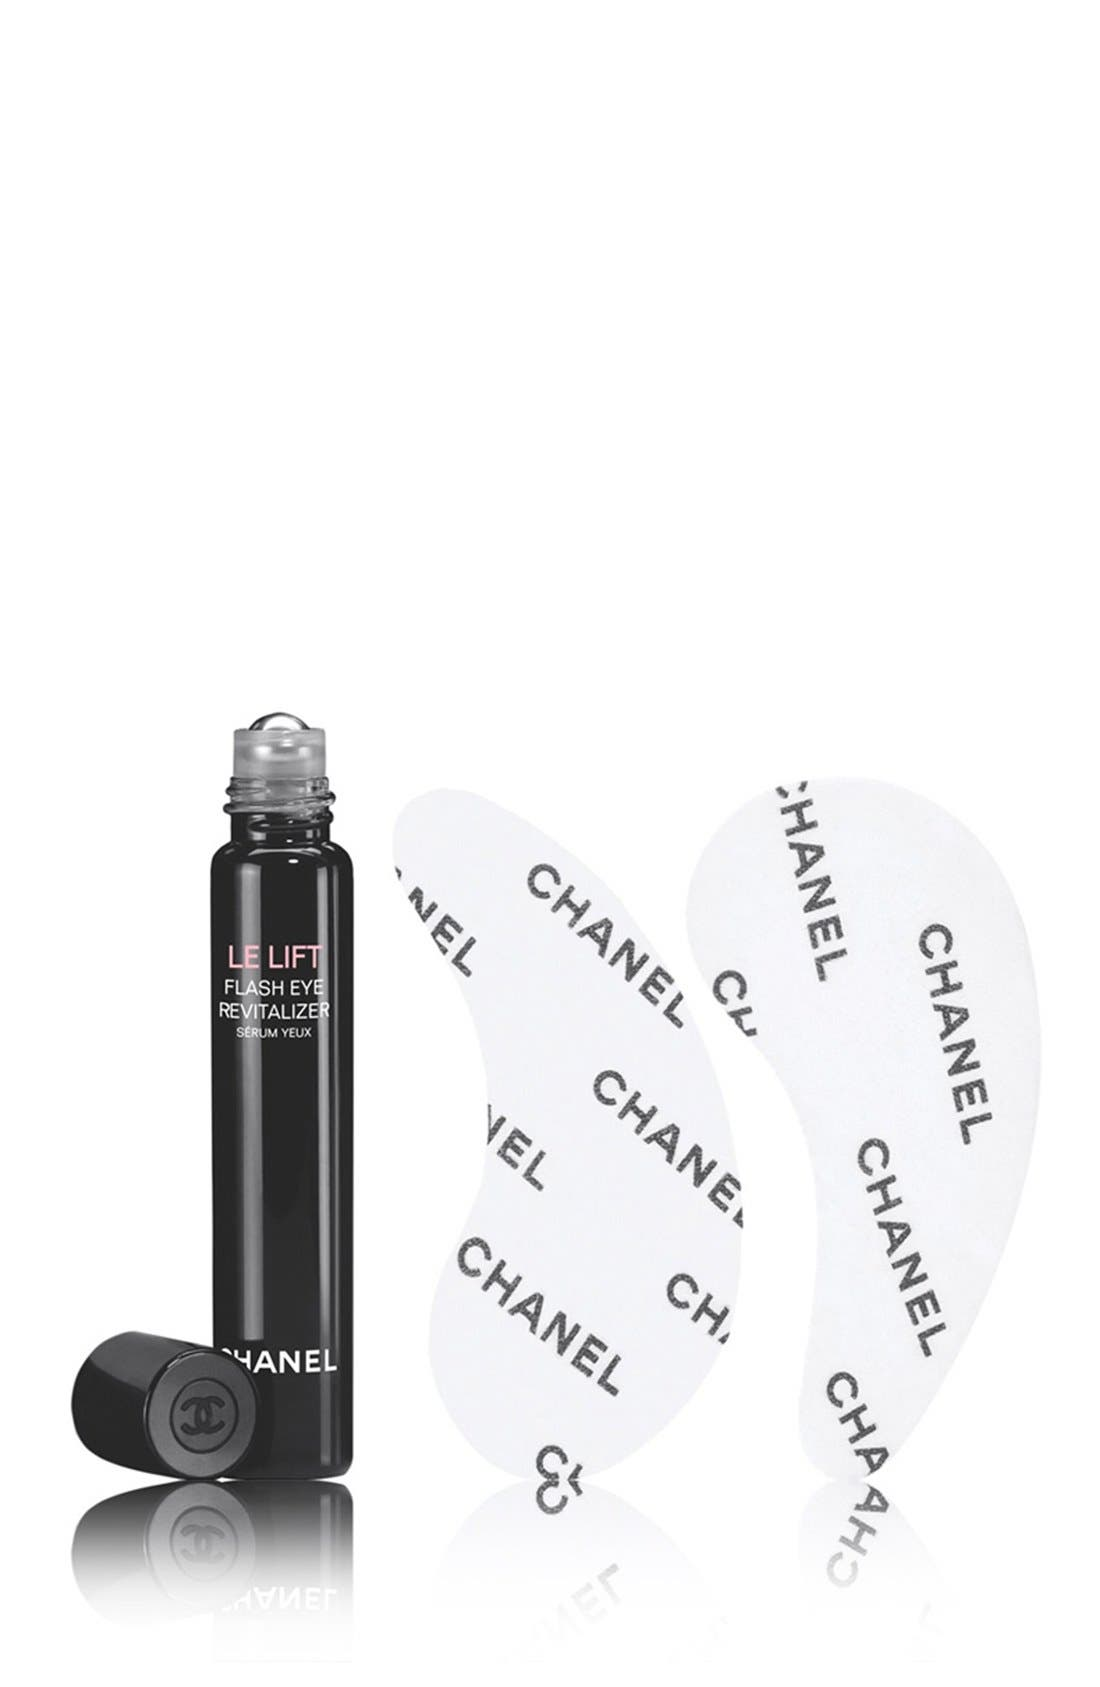 CHANEL LE LIFT  Firming Anti-Wrinkle Flash Eye Revitalizer